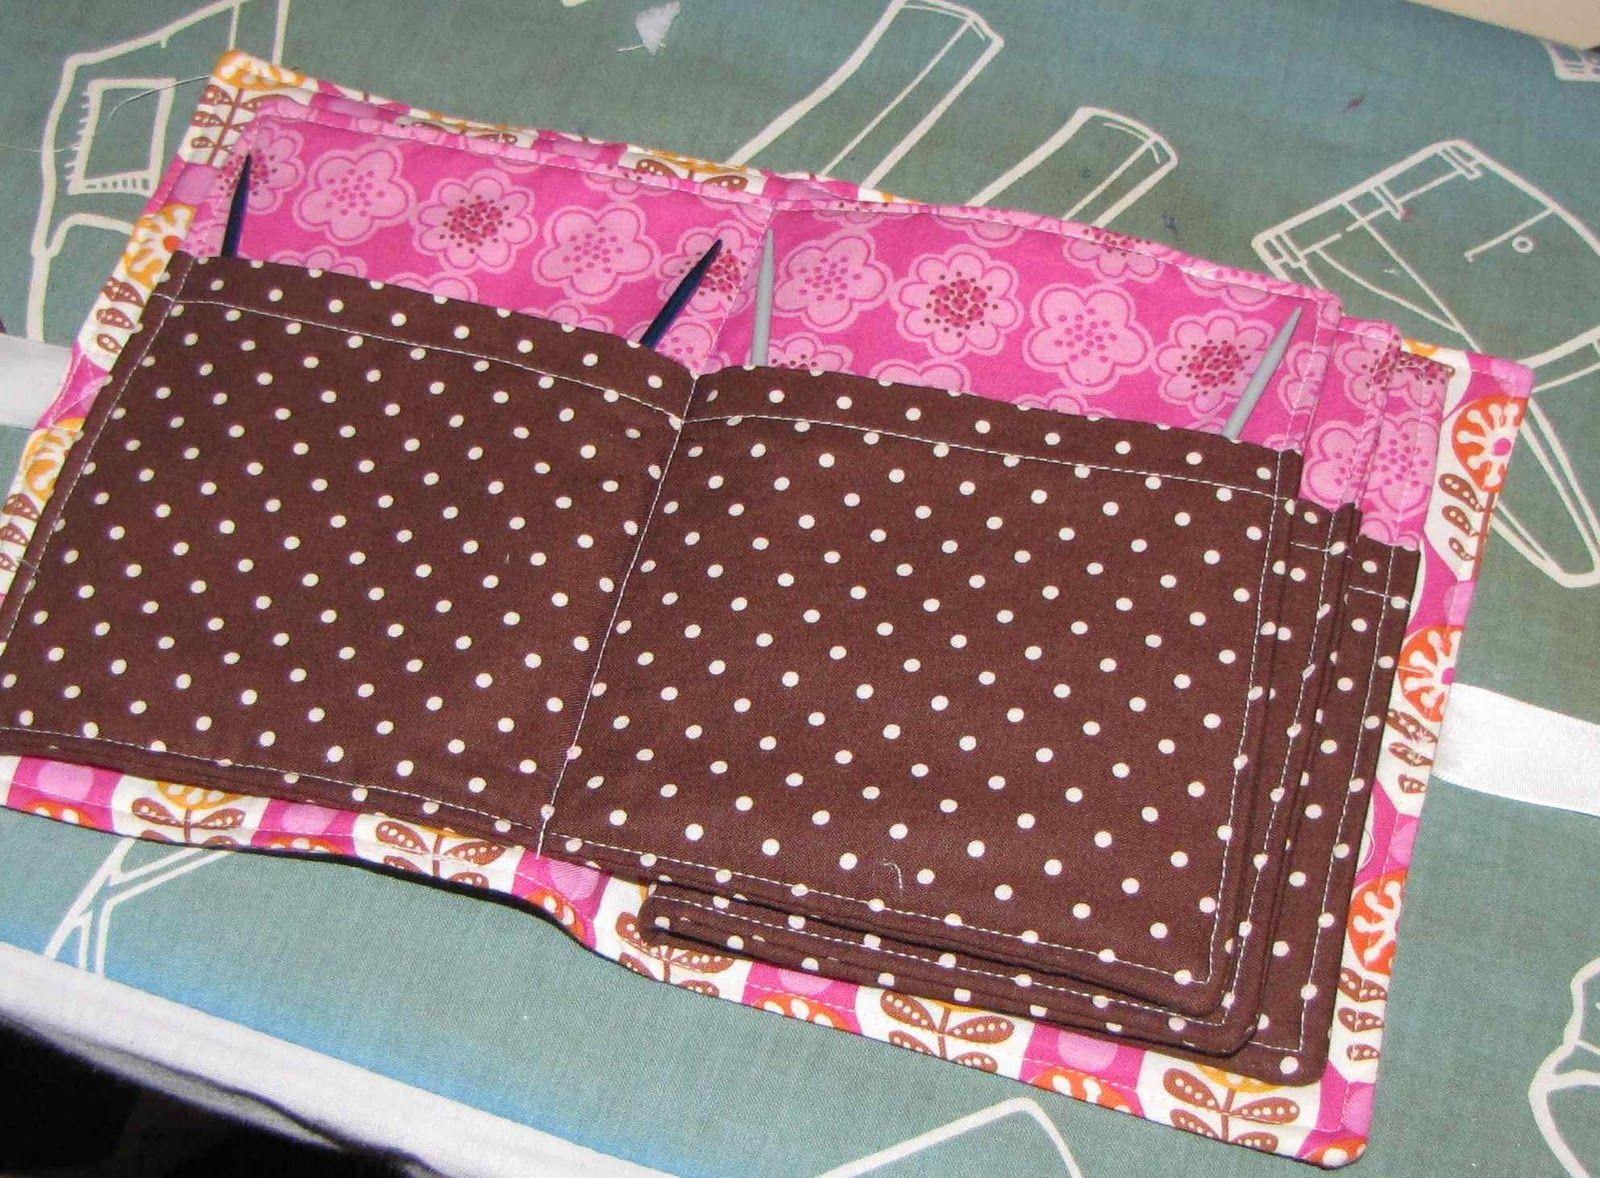 knitting needle holder pattern free | Apple Dumpling Gear: Circular ...